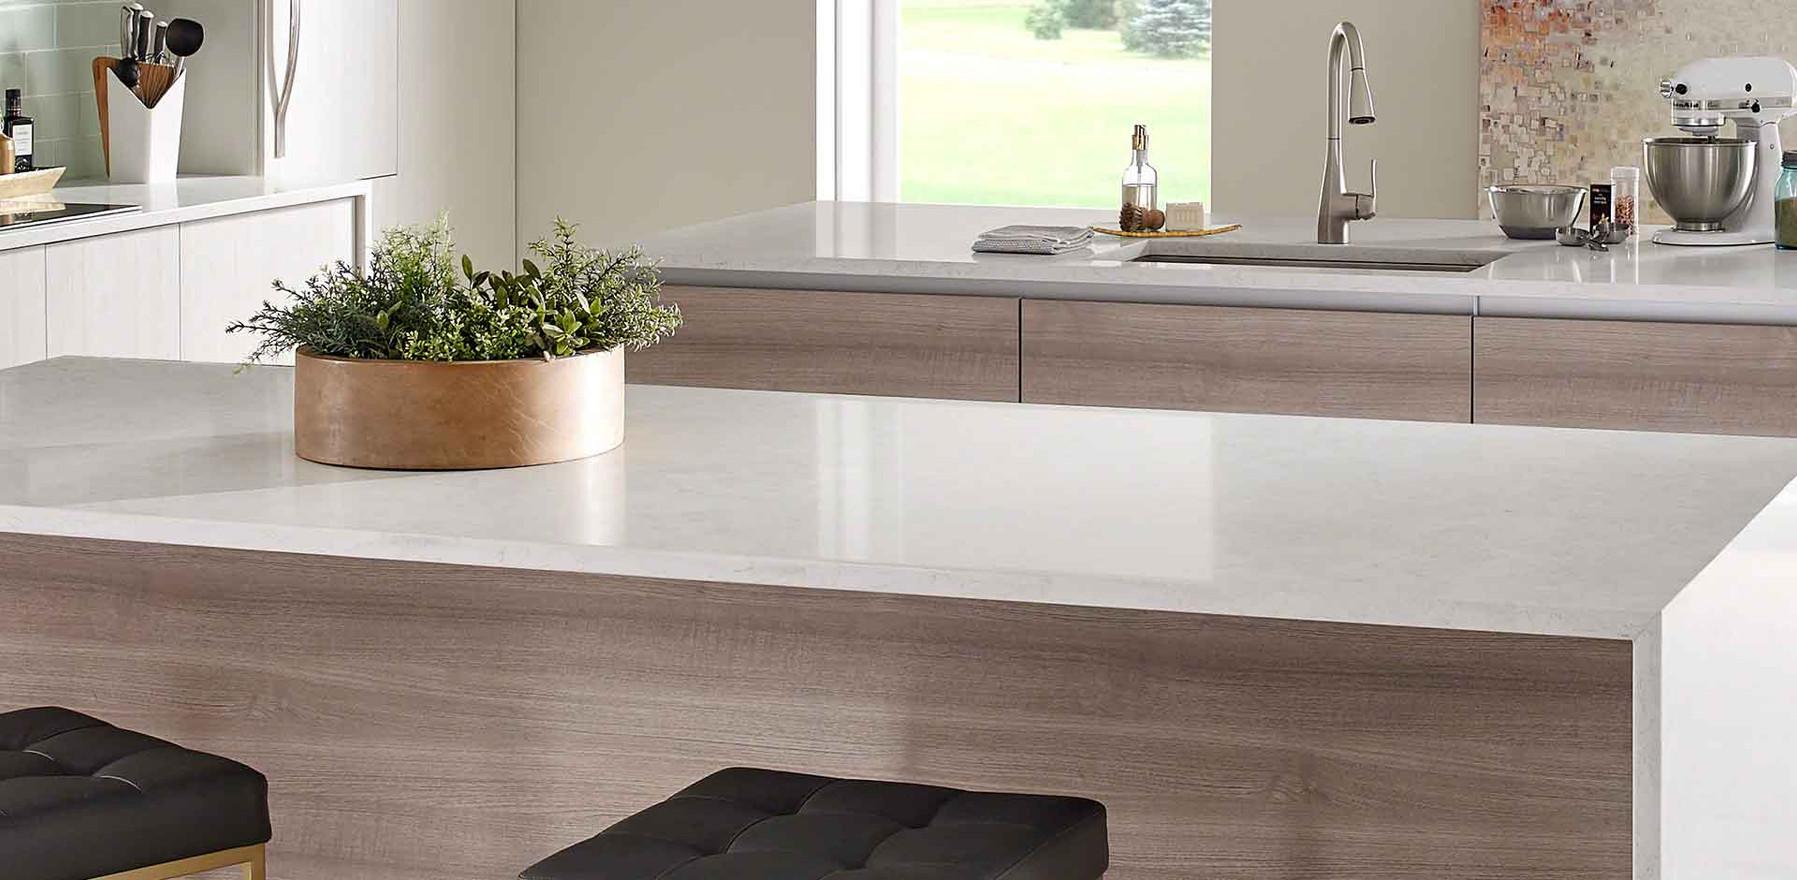 marbella-white-quartz-countertop.jpg